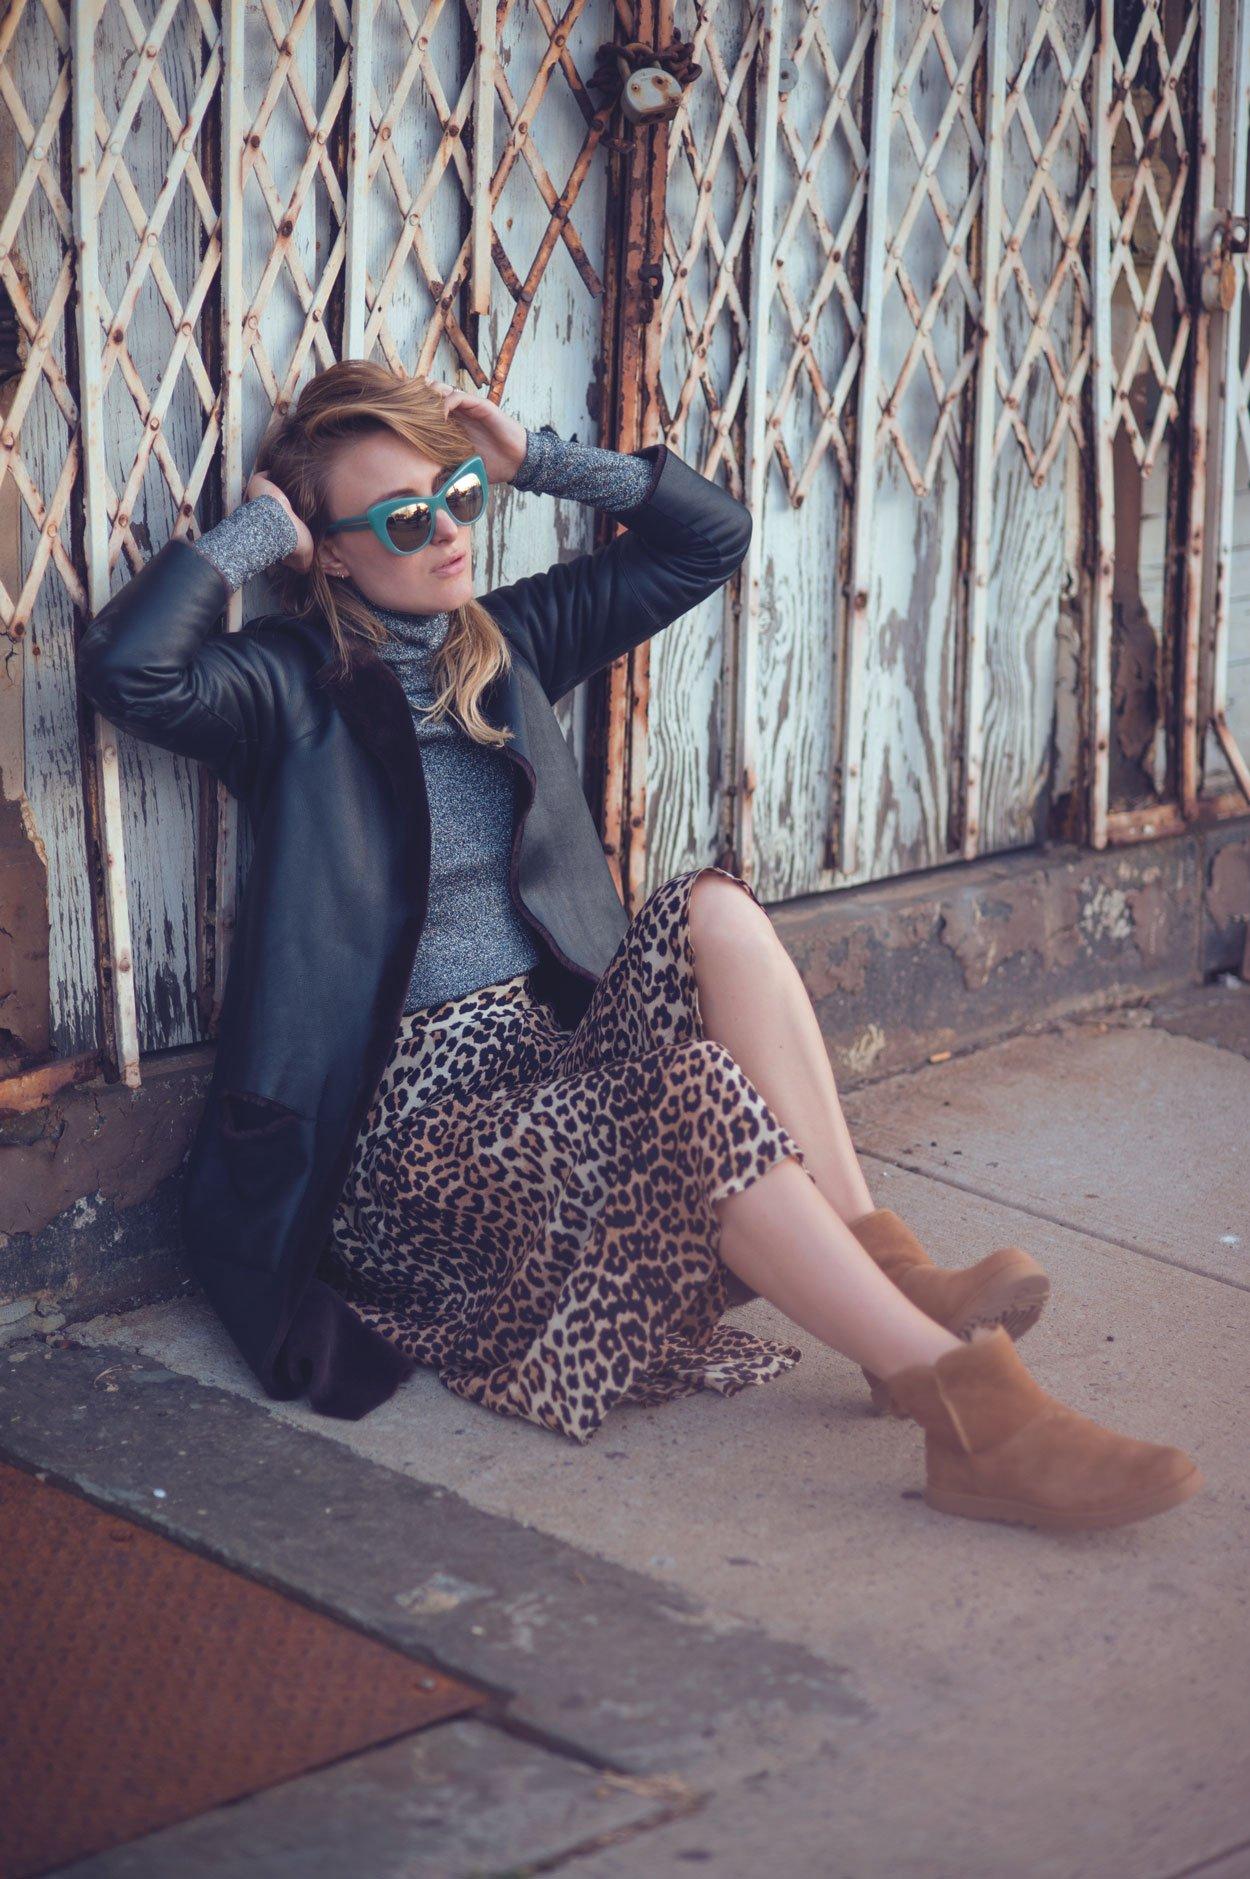 ugg fashion blogger